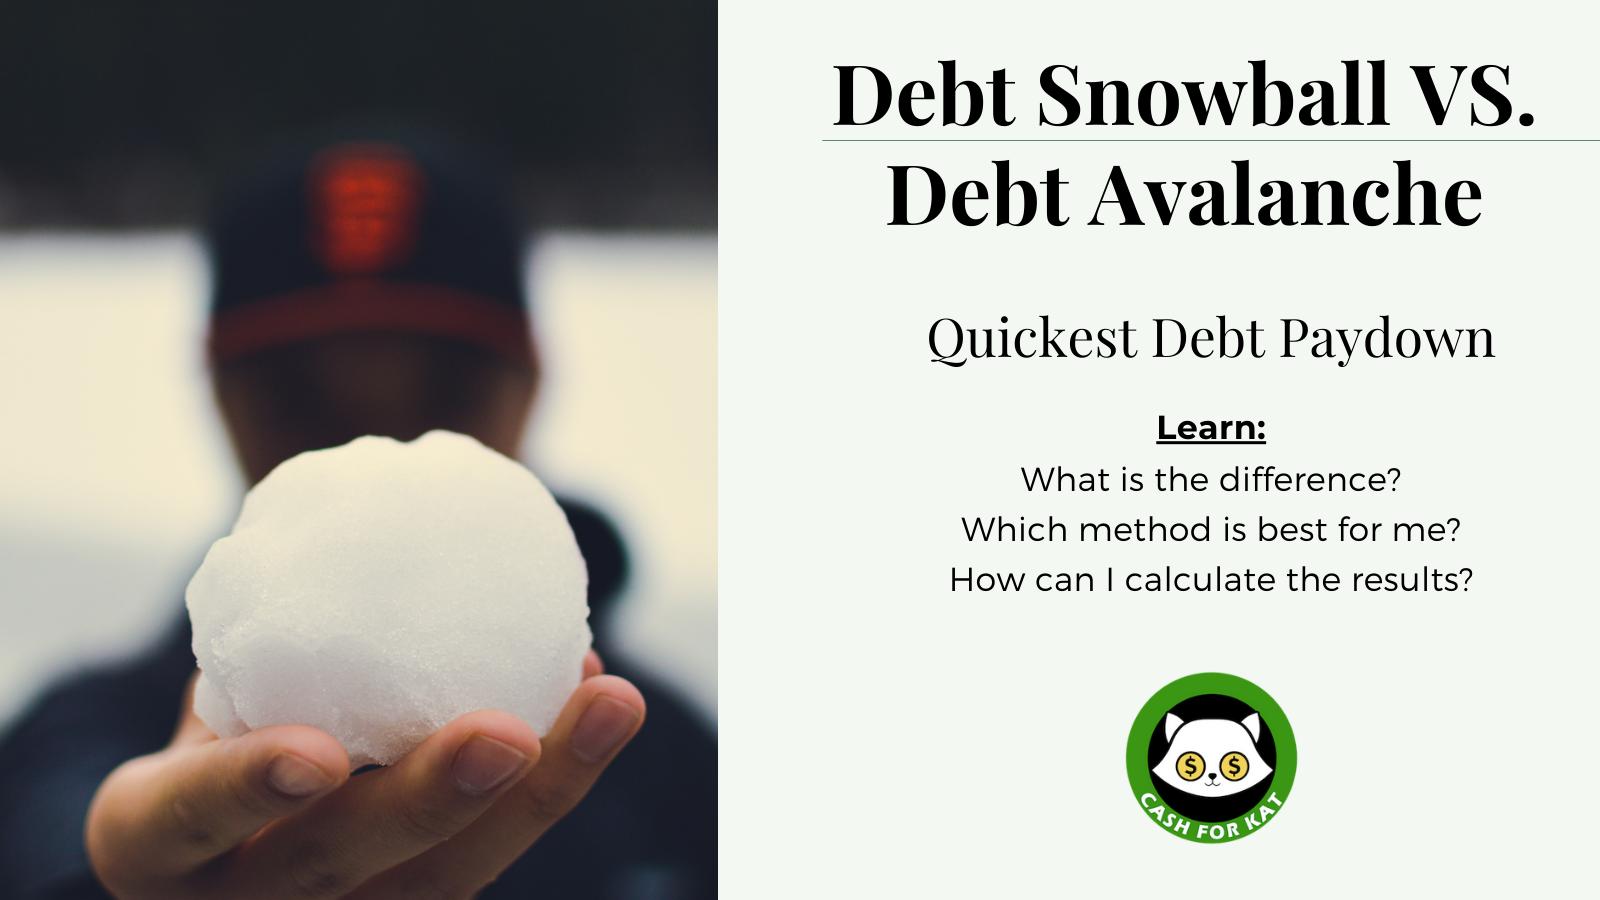 Debt Snowball vs Debt Avalanche title